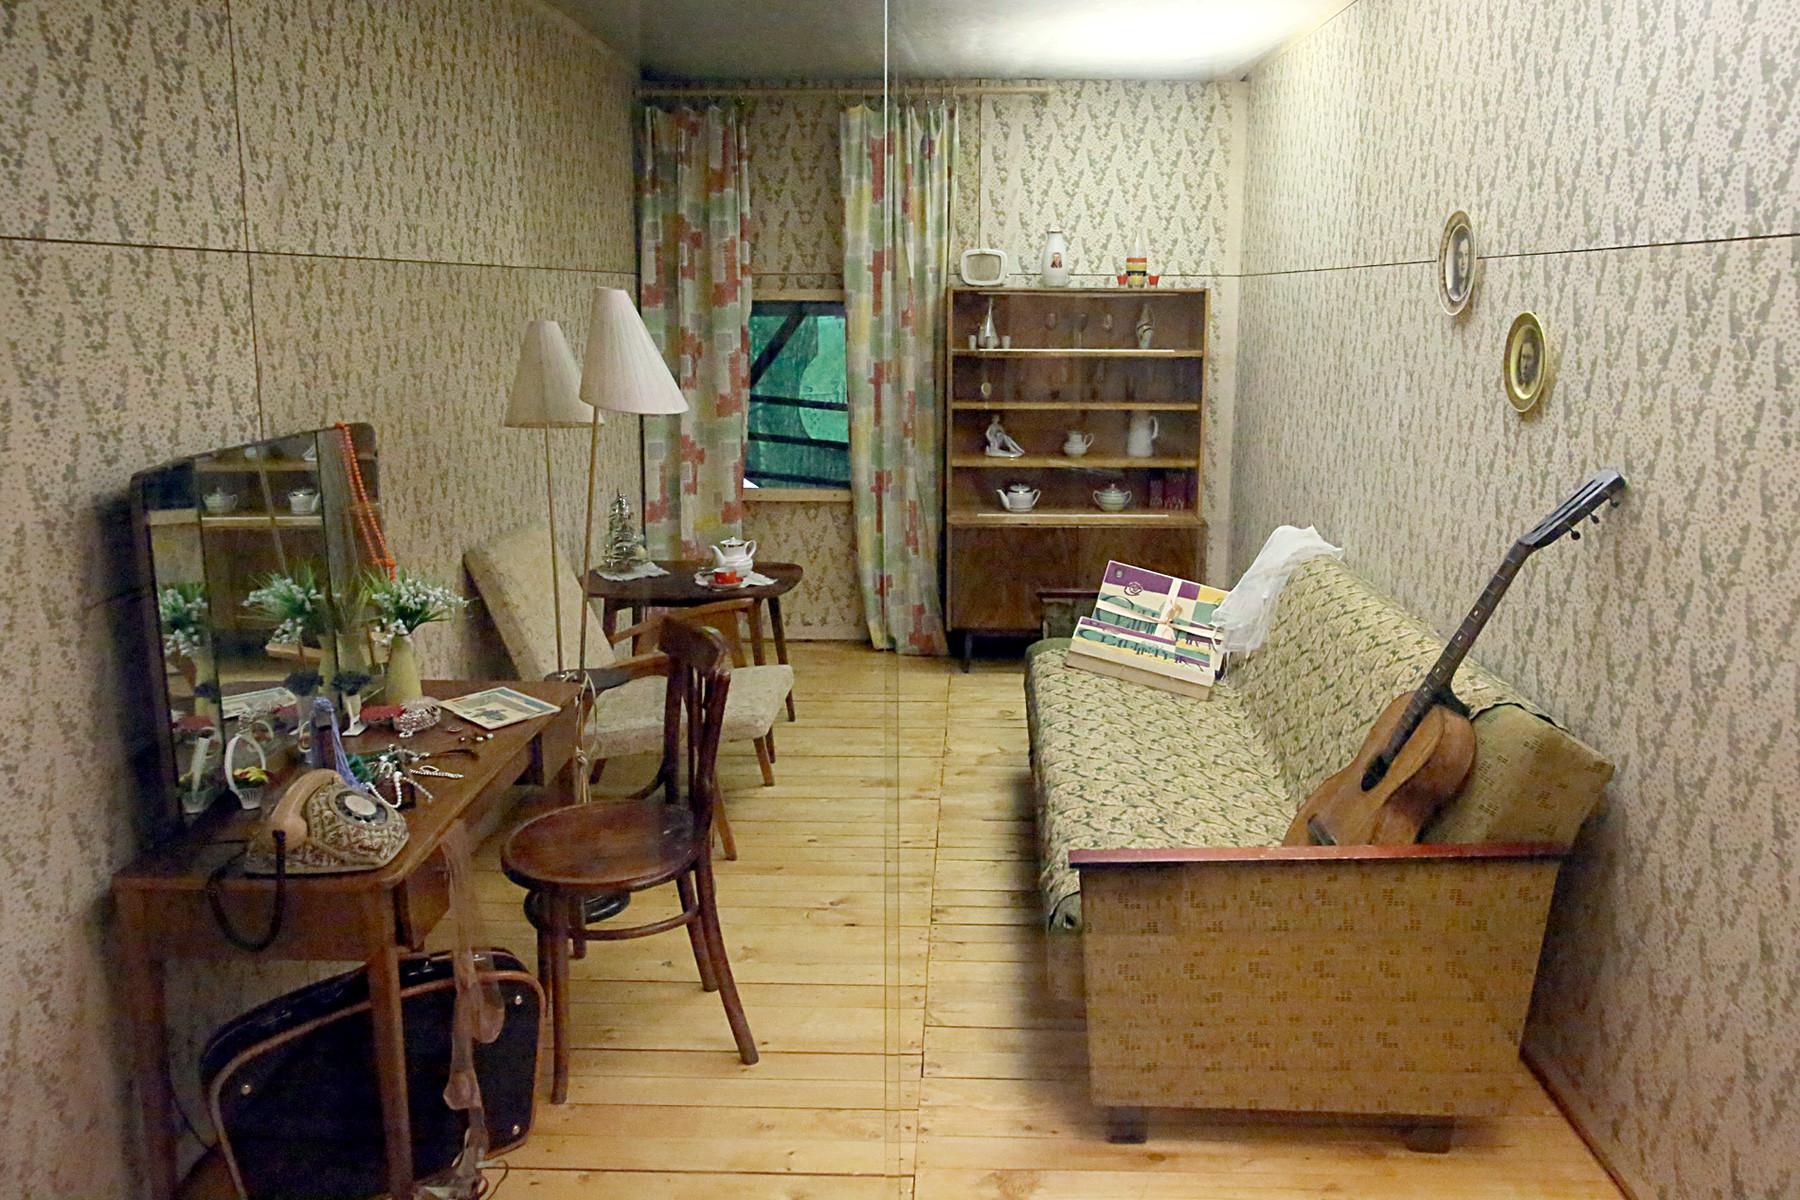 Living room in 1980s